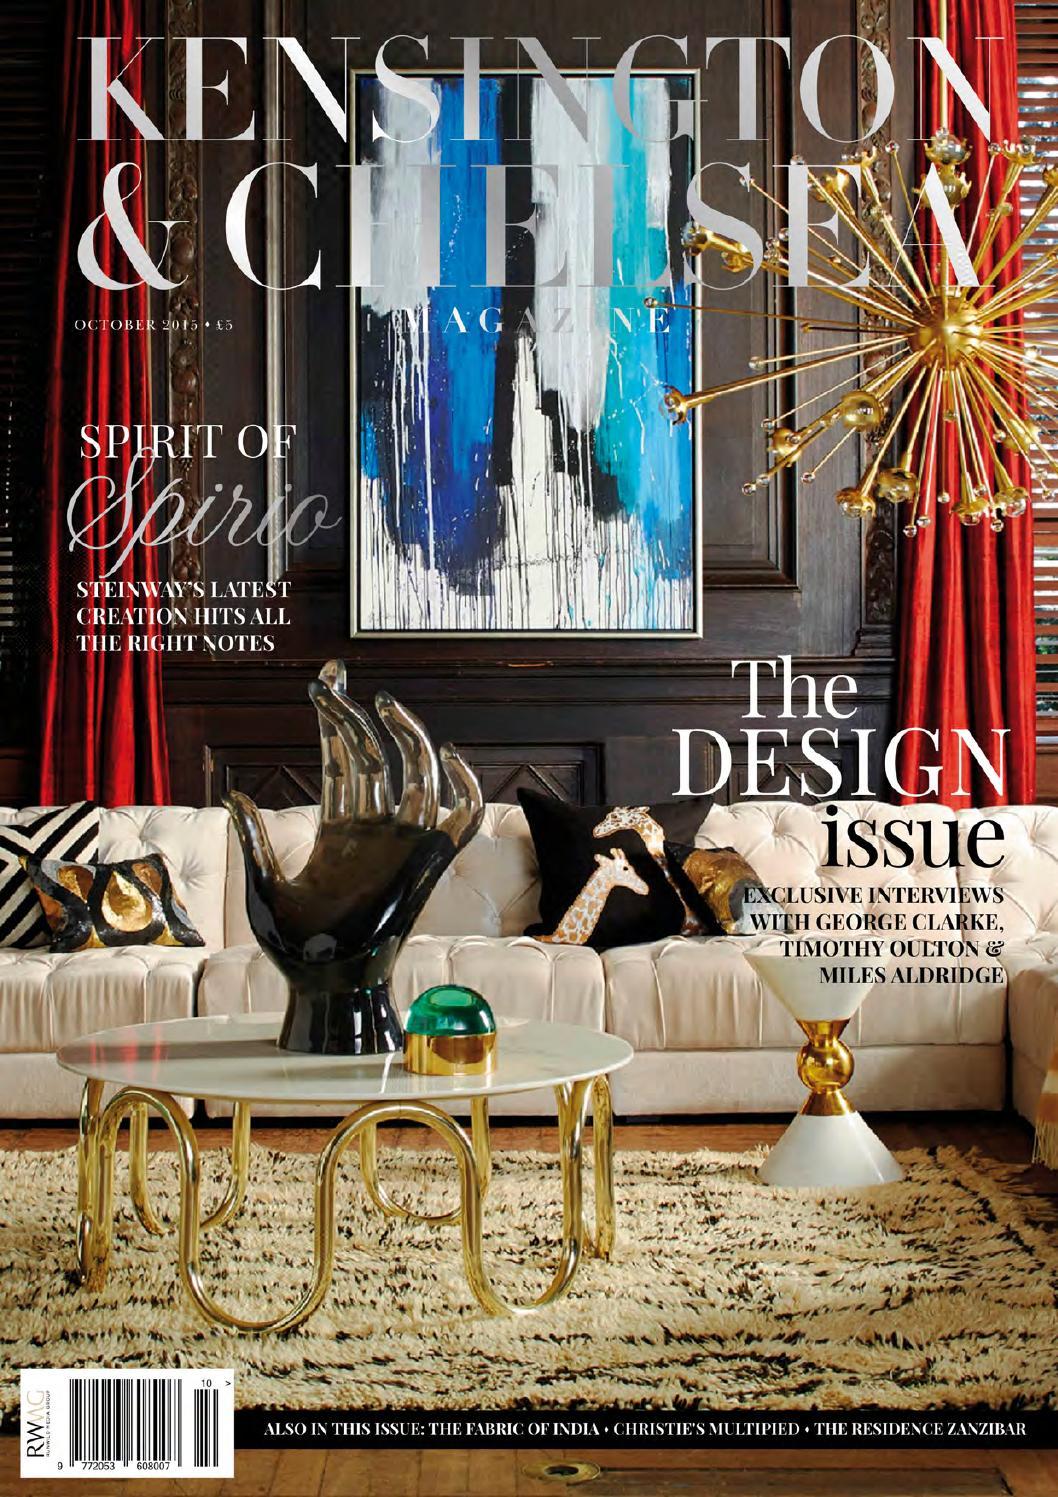 The Kensington Chelsea Magazine October 2015 By Runwild Media Group